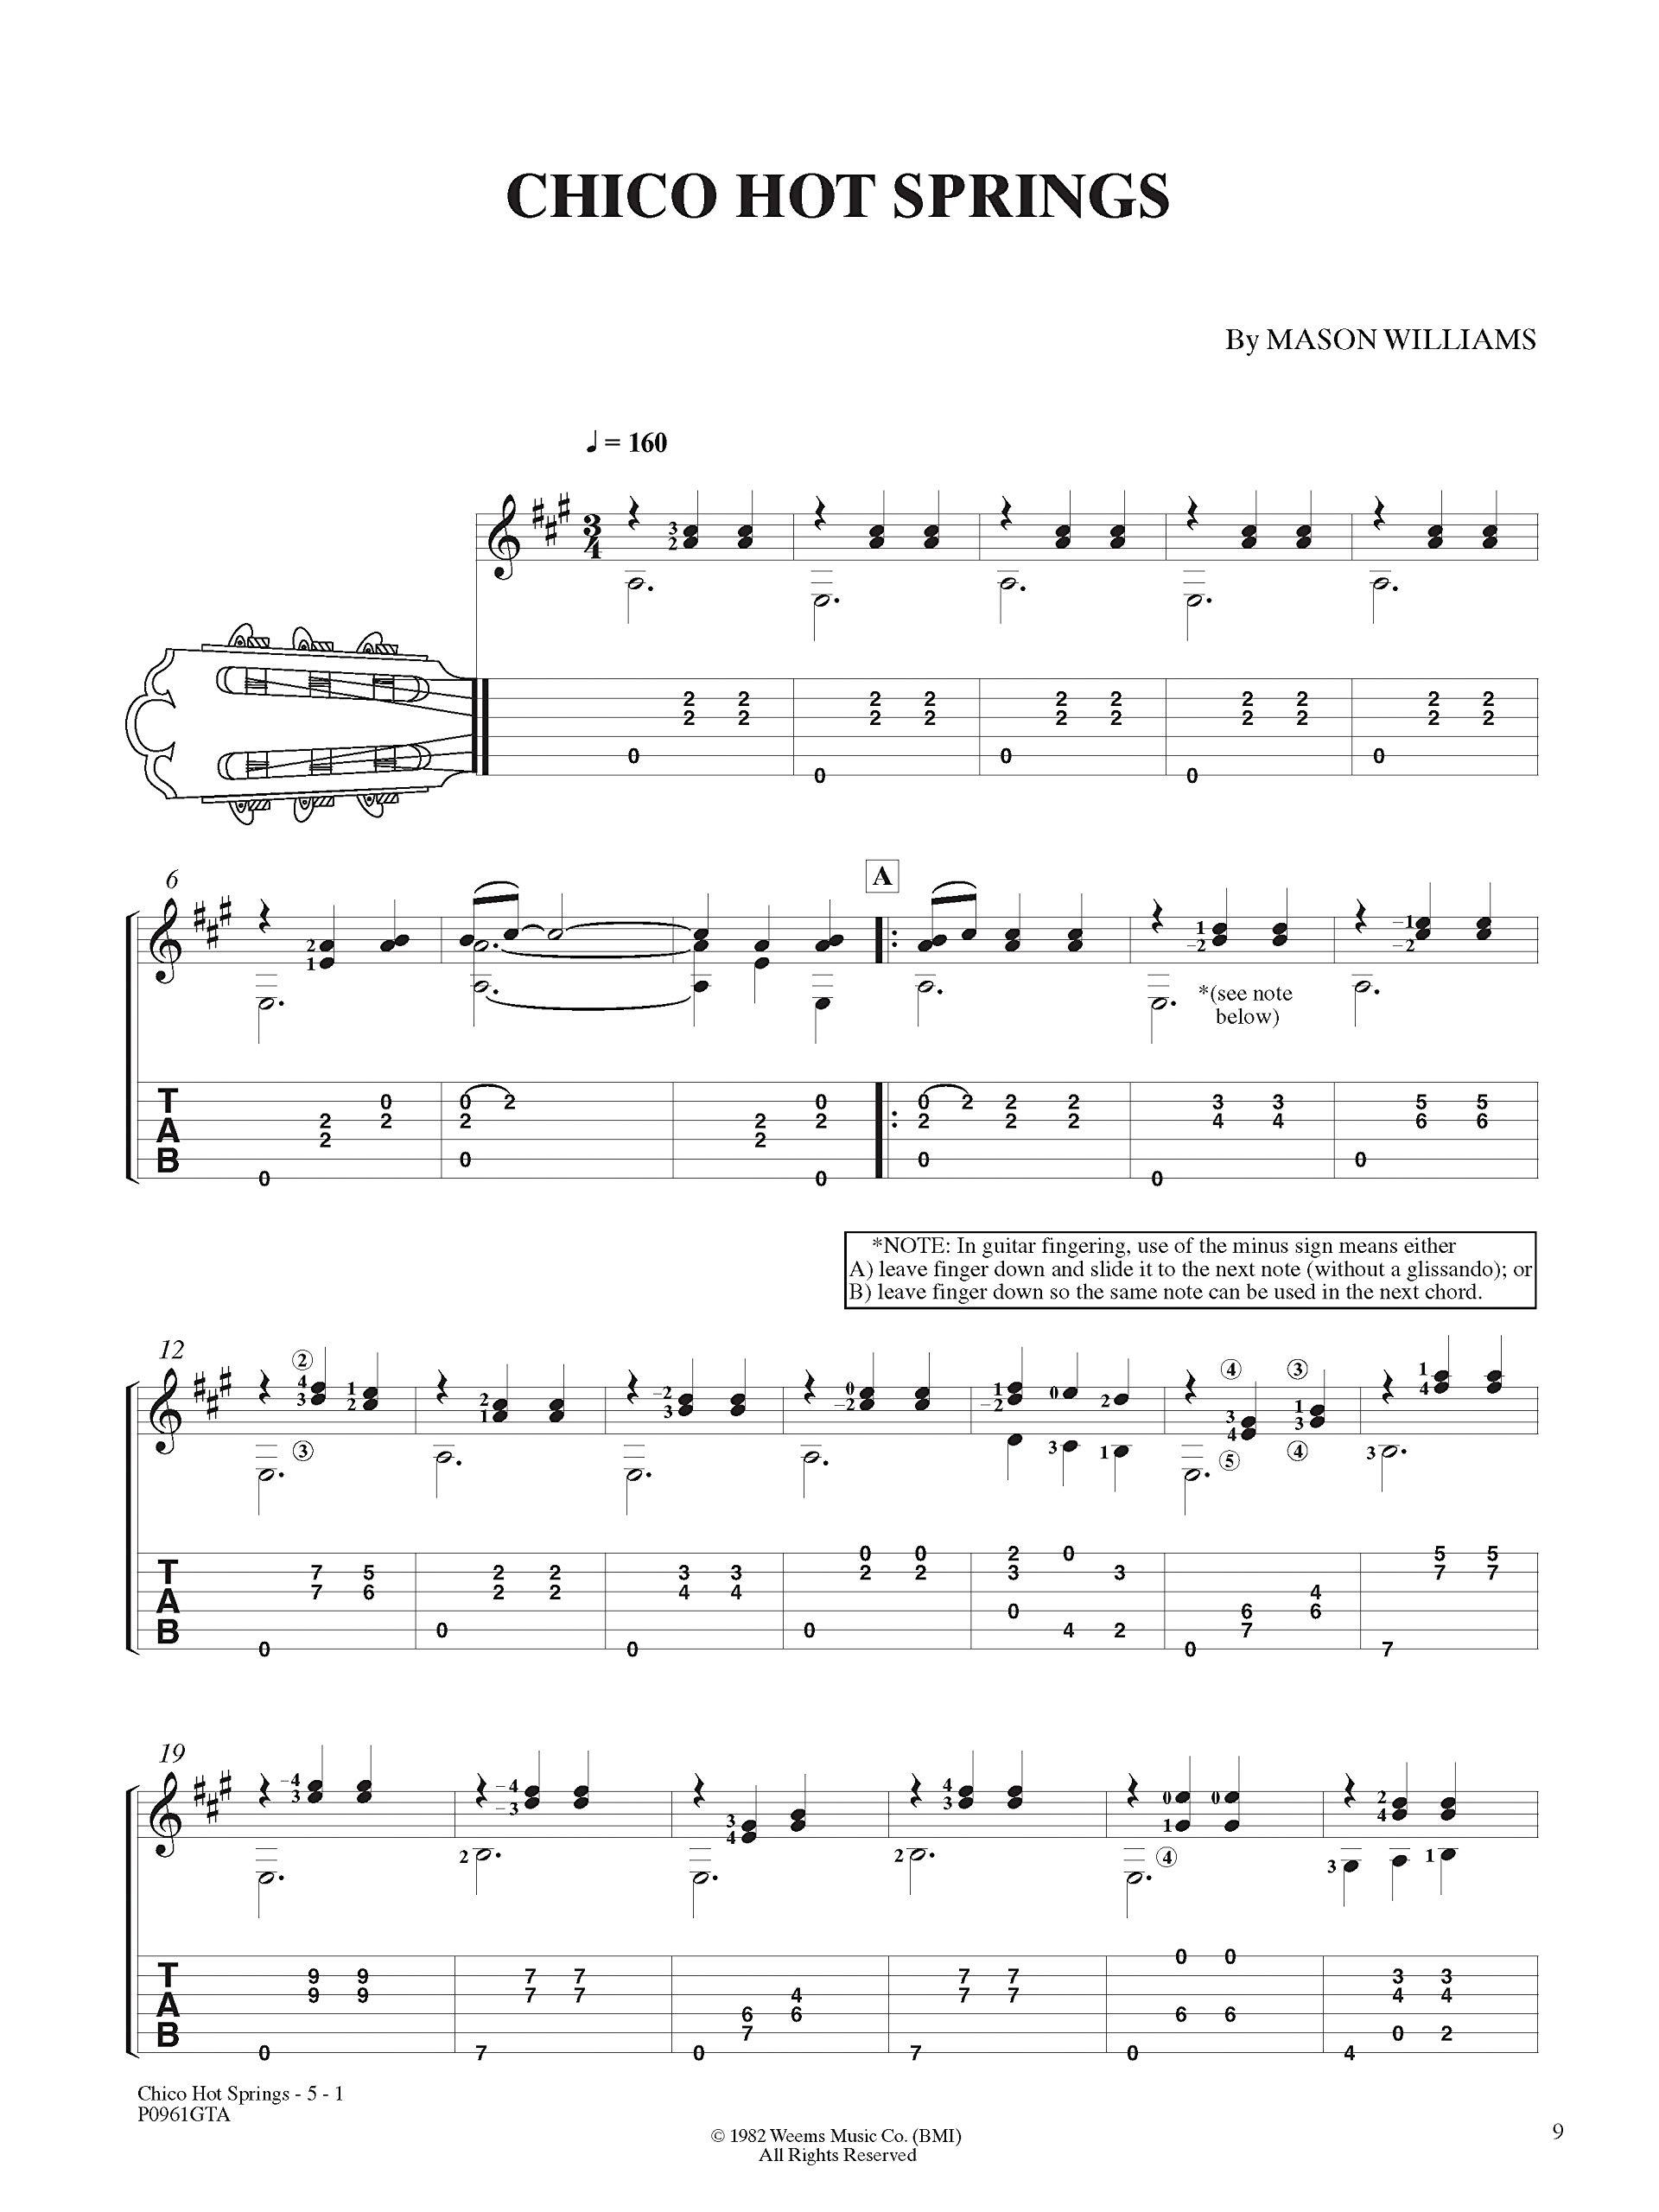 Classical Gas -- The Music of Mason Williams: Guitar Tab, Book ...